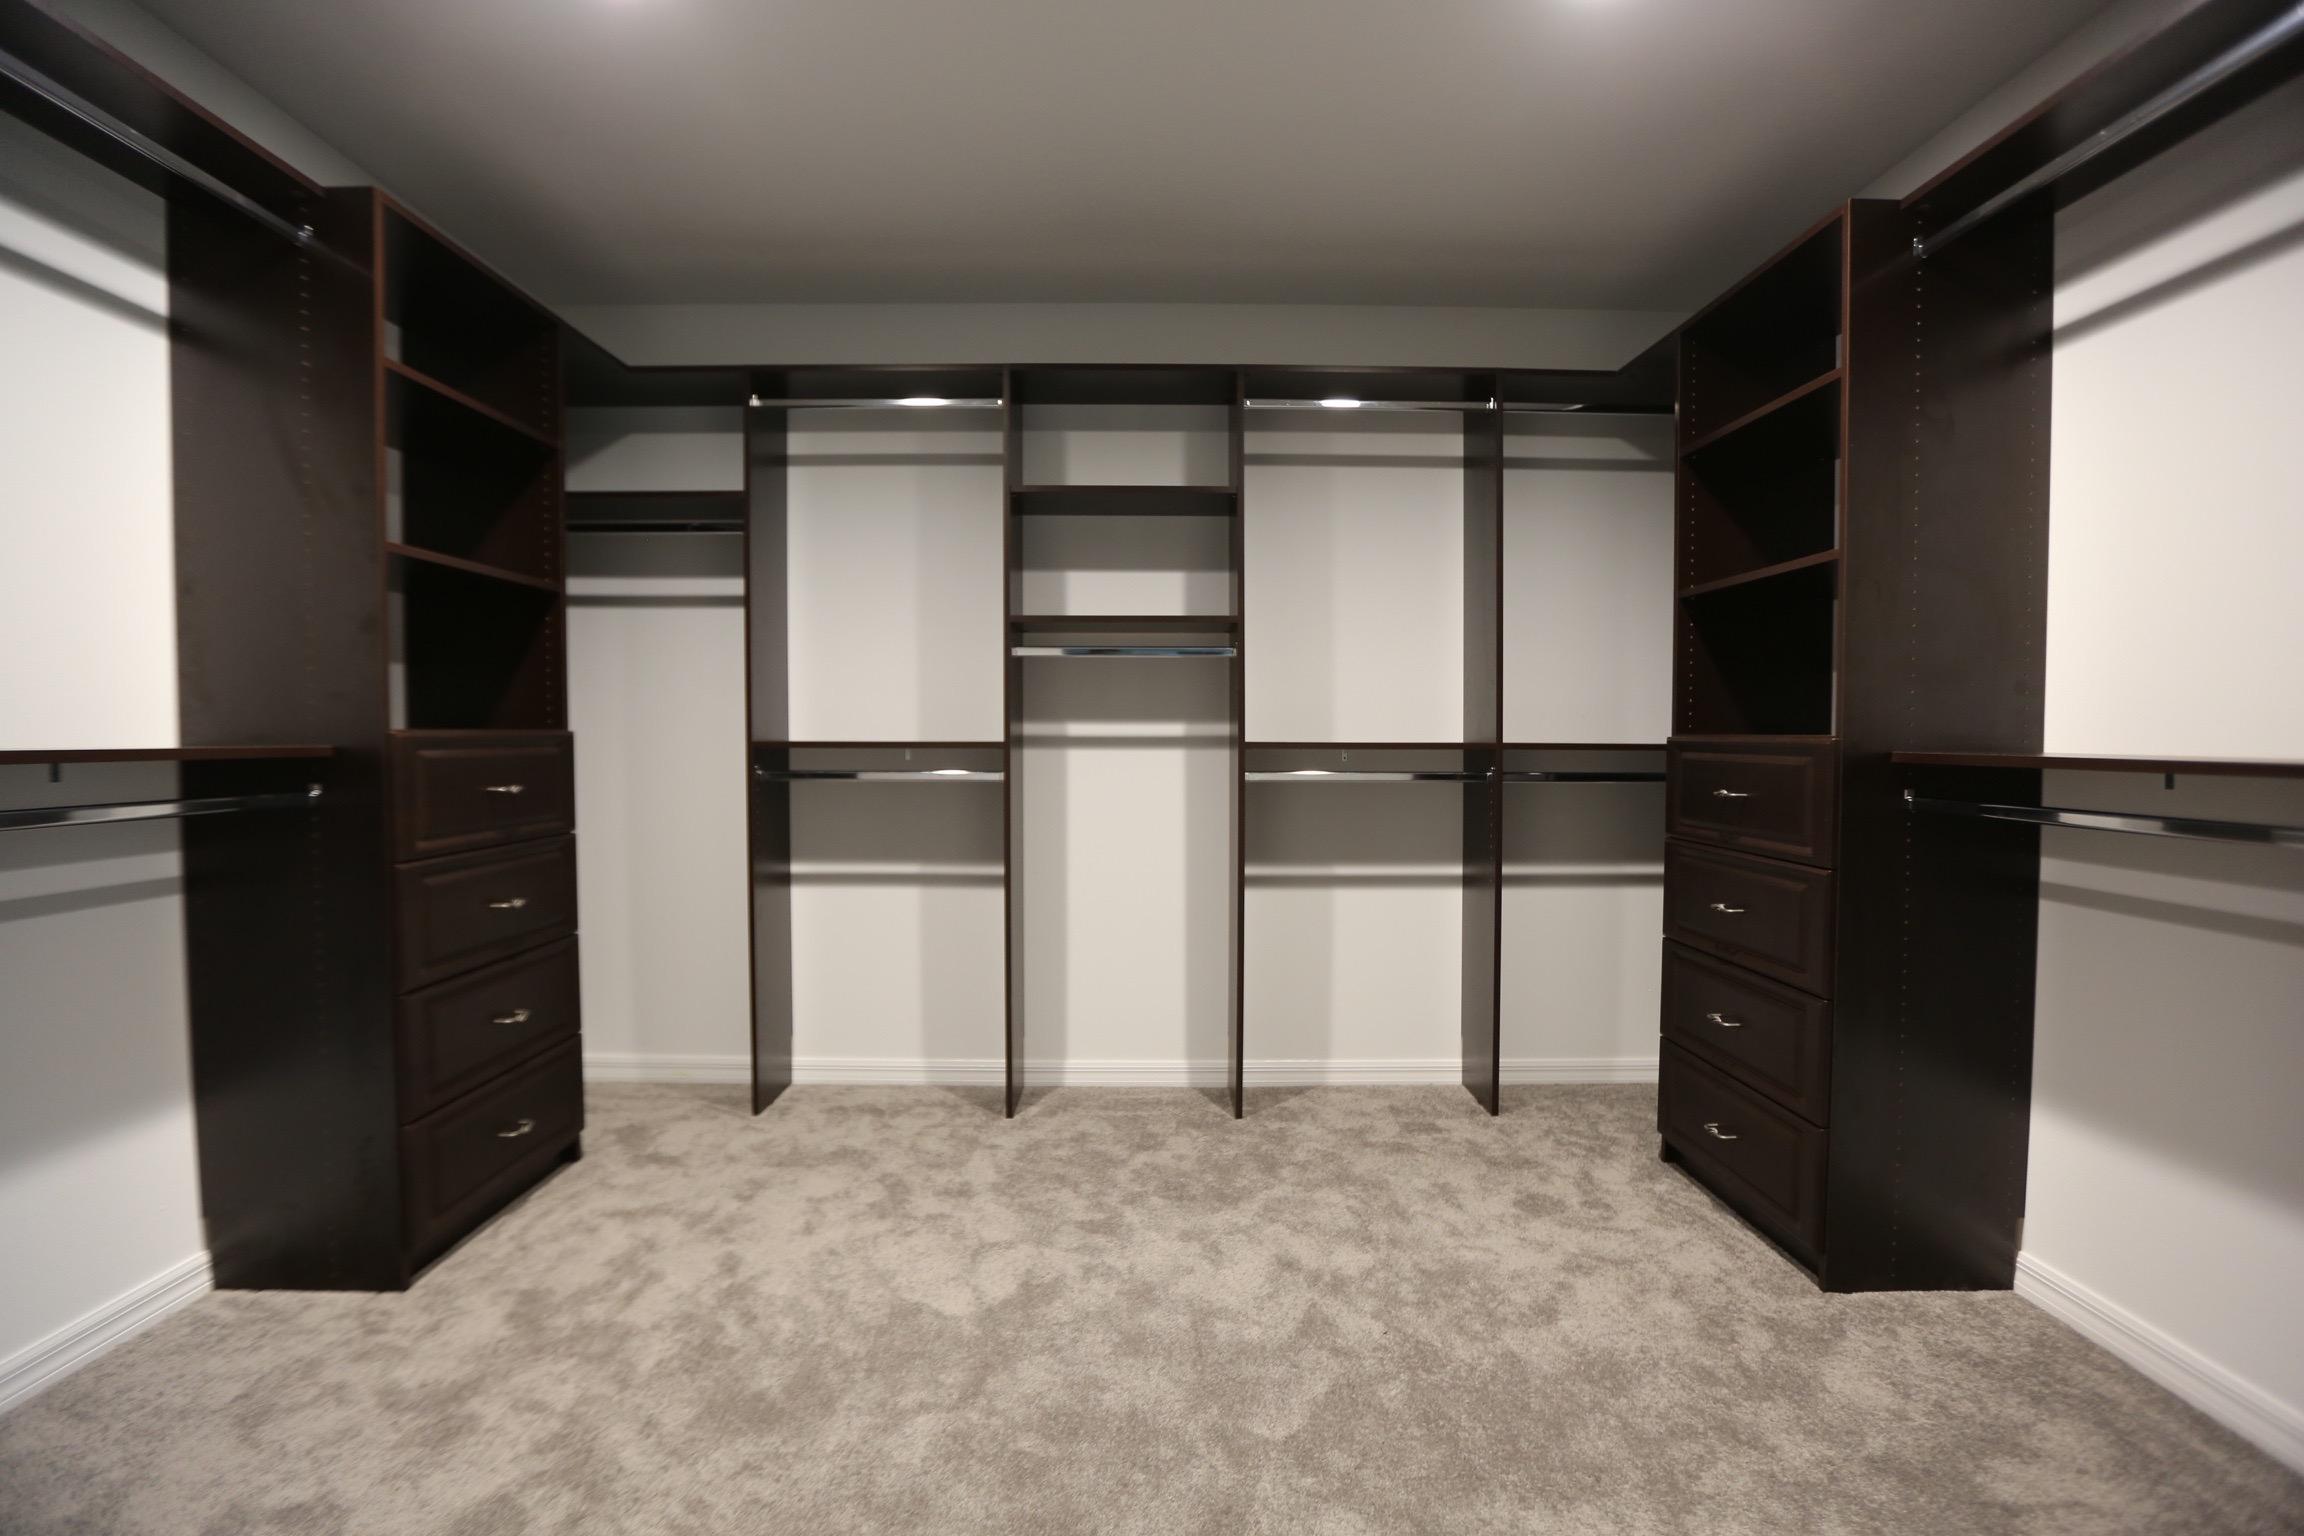 Floor Based Closets:  Open